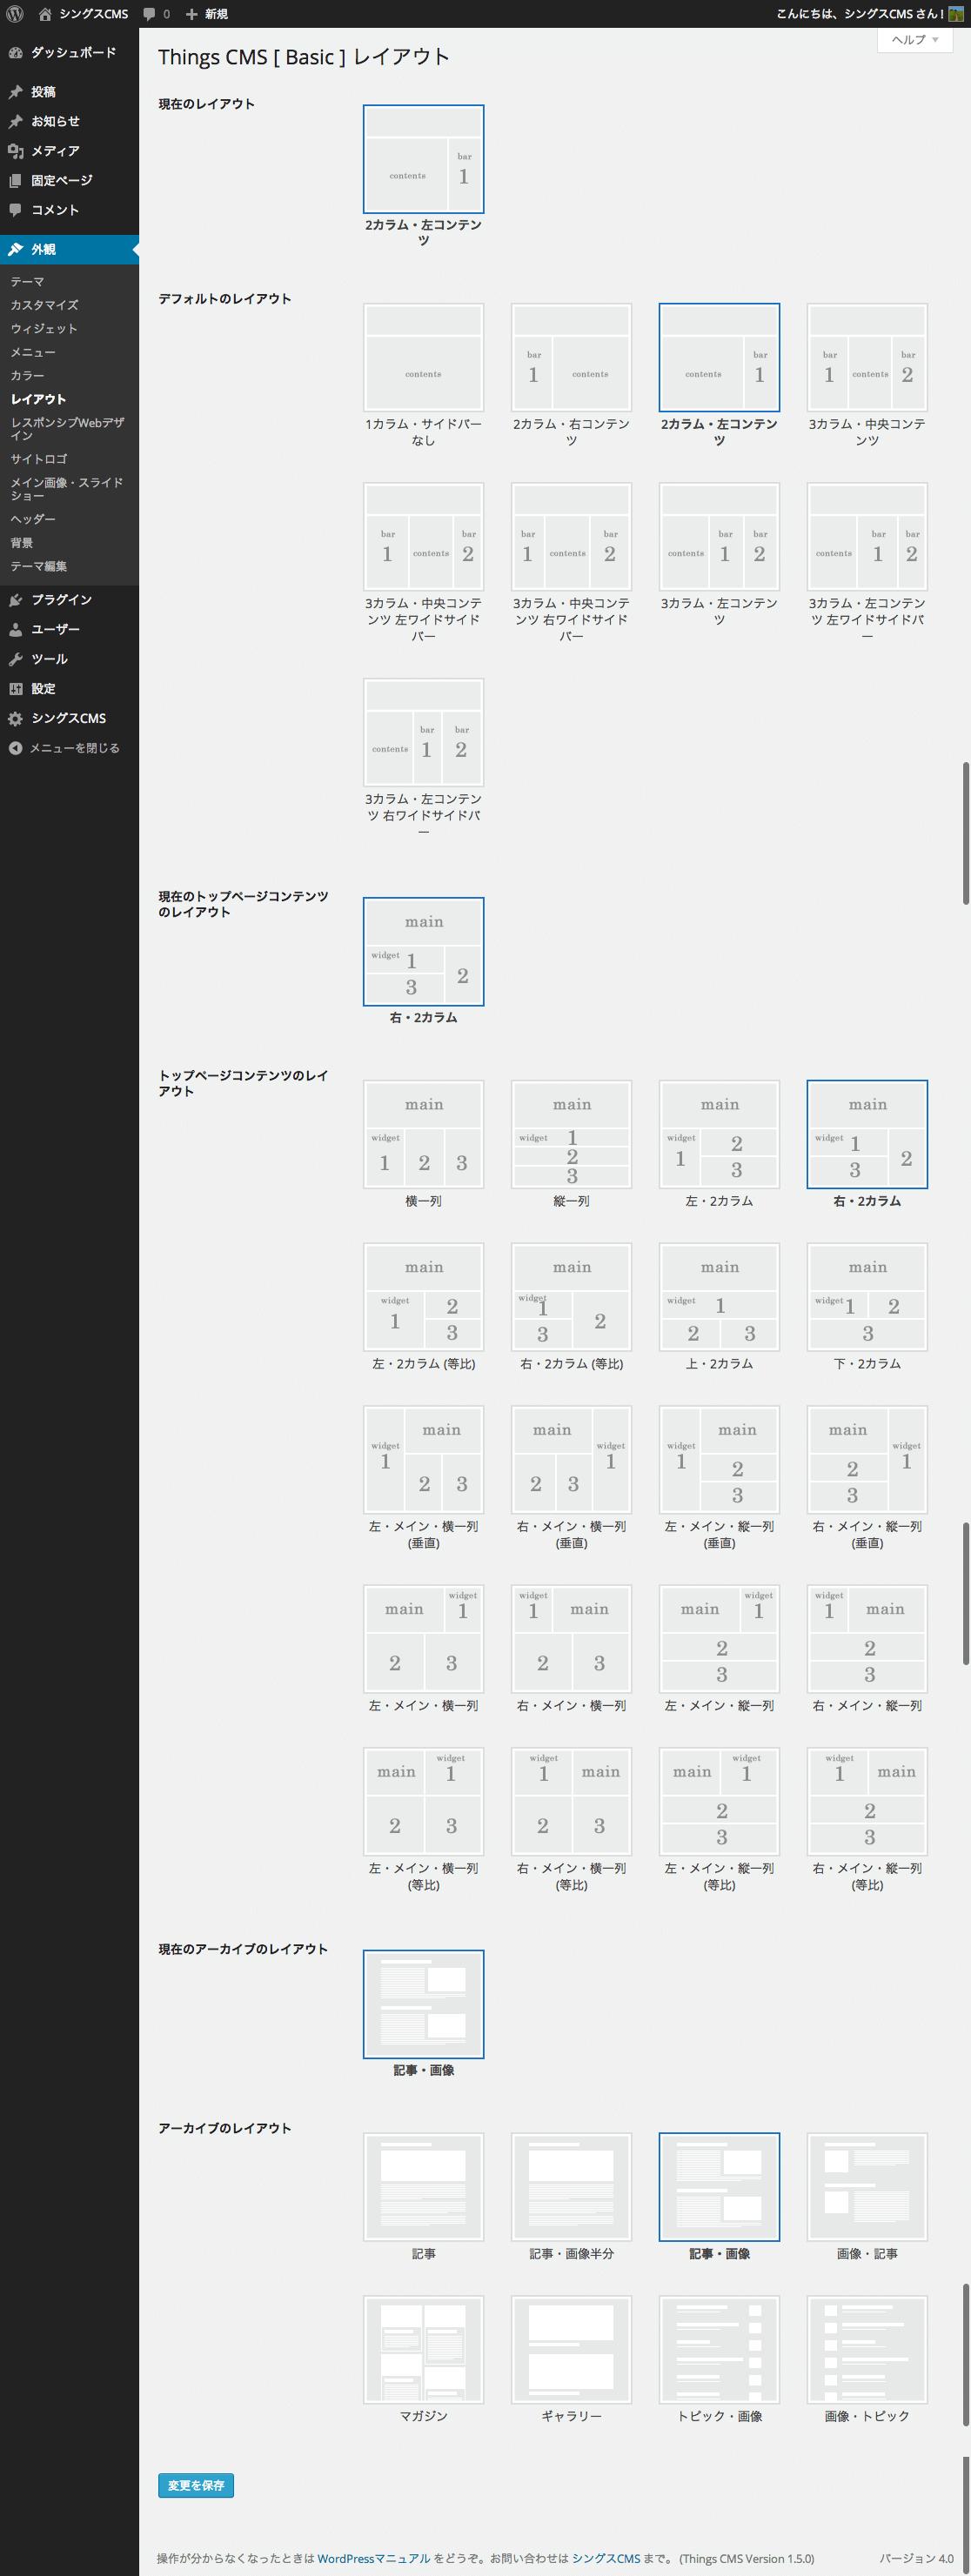 screenshot-thingscms-layout-fs8